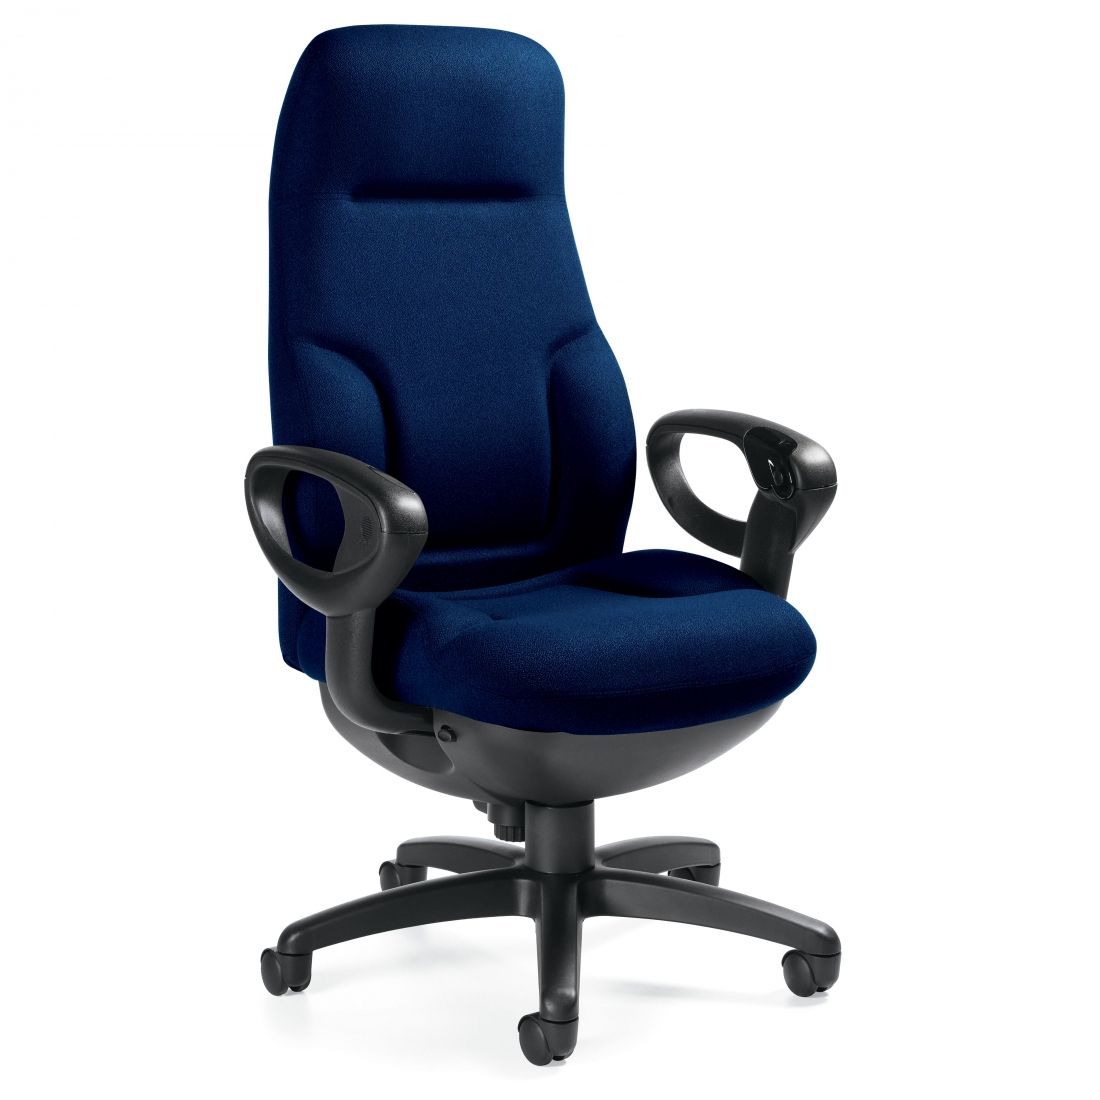 Ergonomic executive office chairs md dc va office